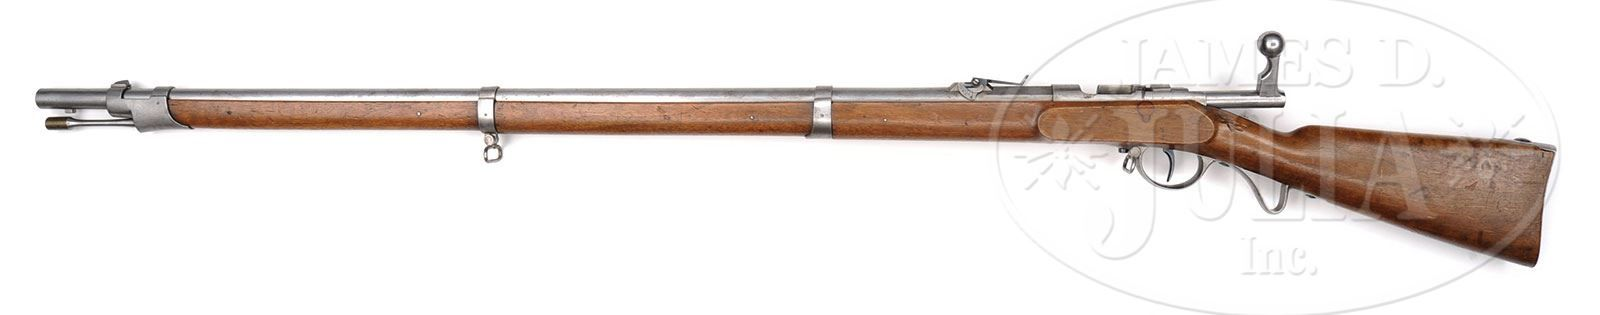 Mauser-Norris.jpg